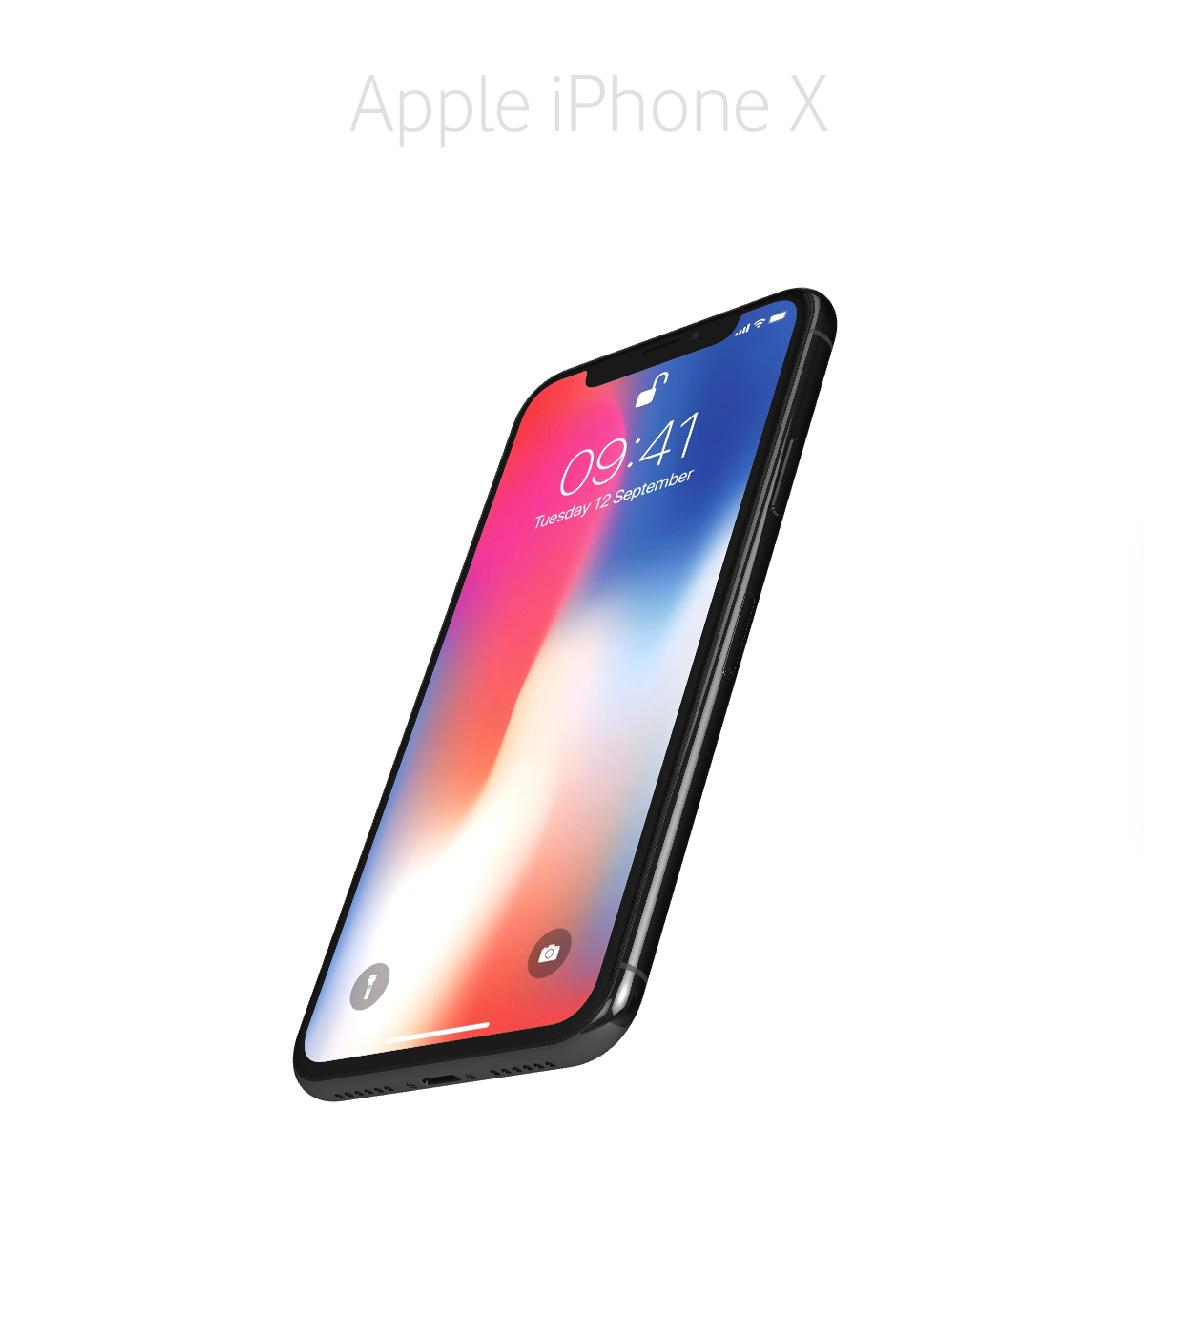 Laga glas skärm framsida iPhone X